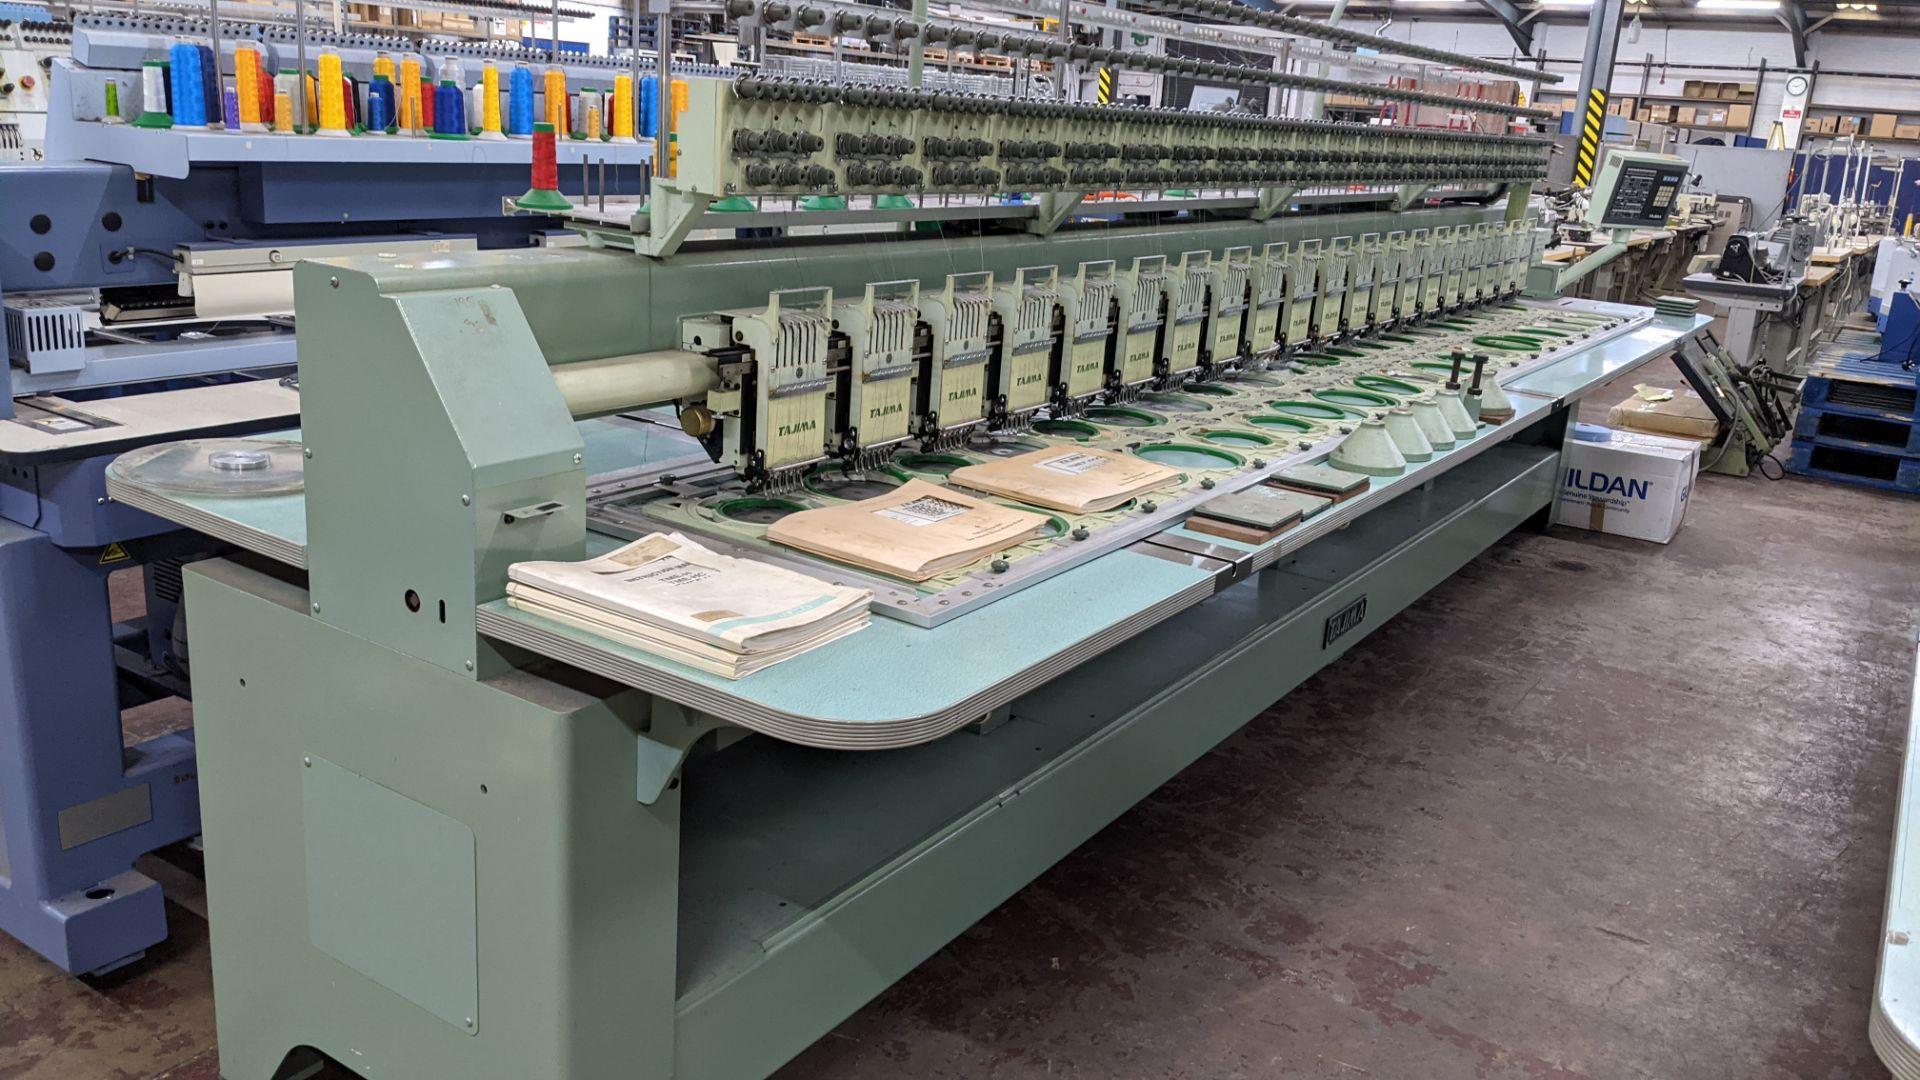 Tokai Tajima electronic 20 head automatic embroidery machine model TMEF-H620 - Image 13 of 25